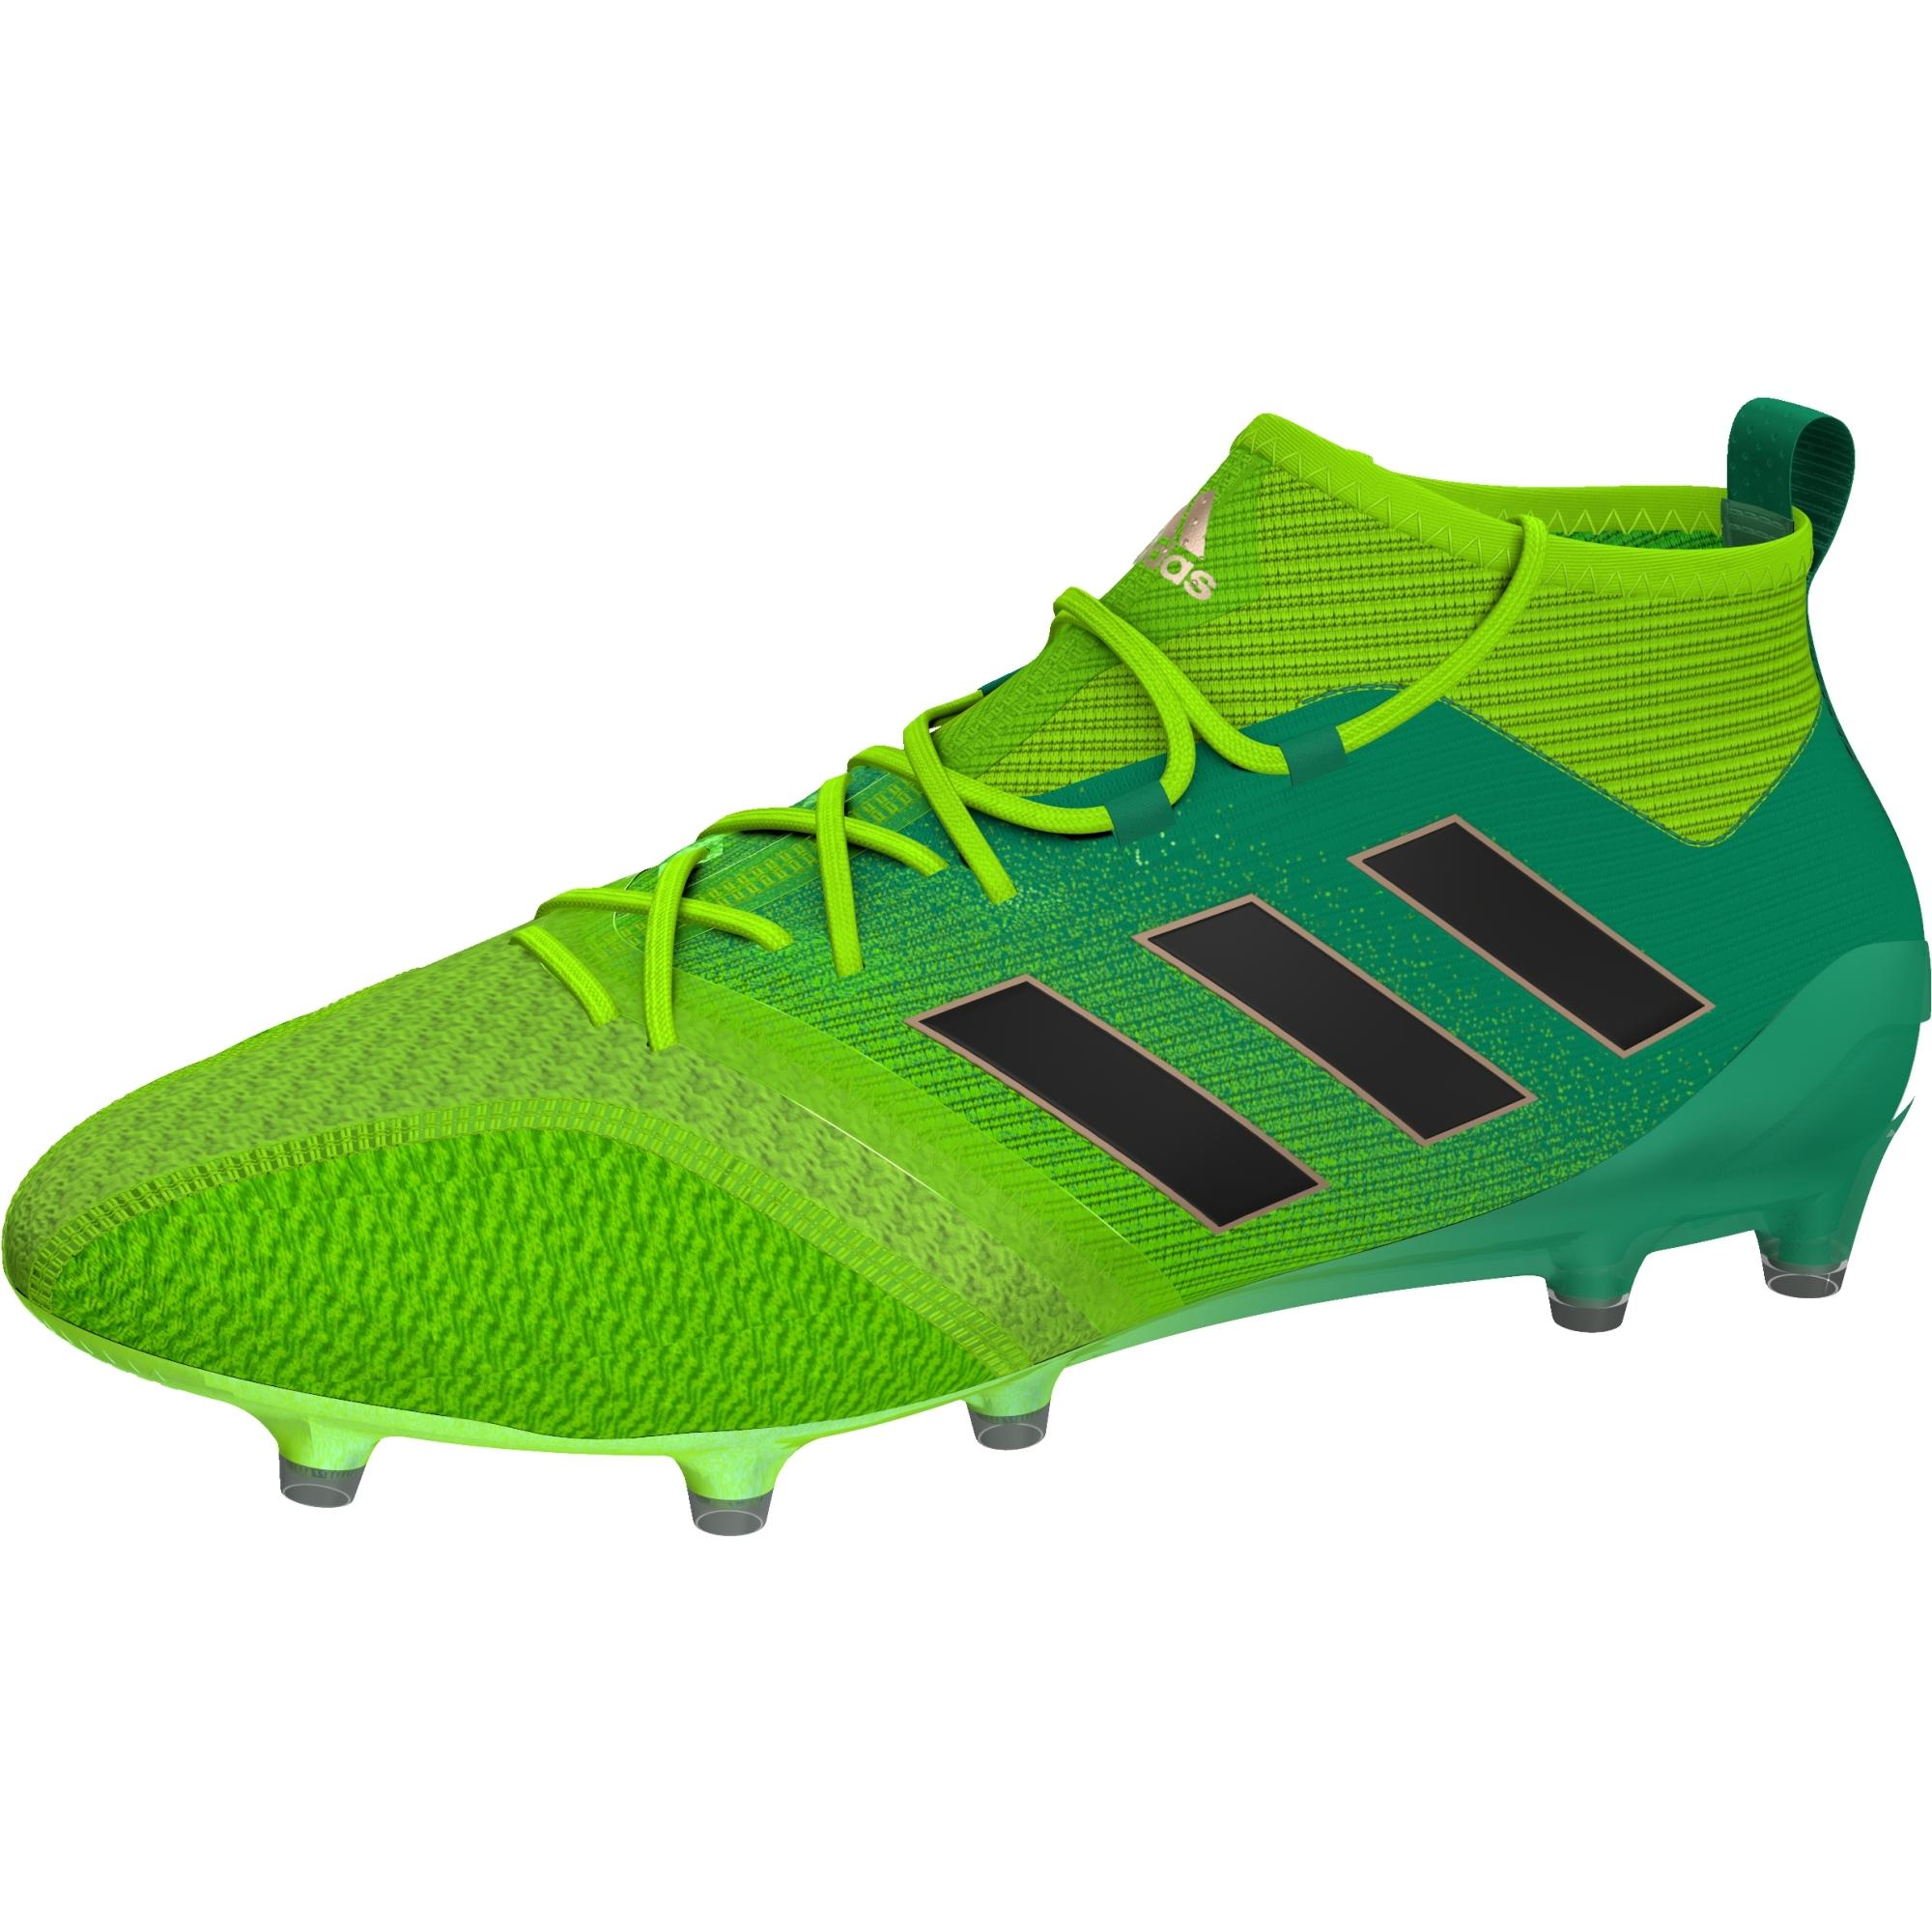 Adidas Ace 17.1 Primeknit